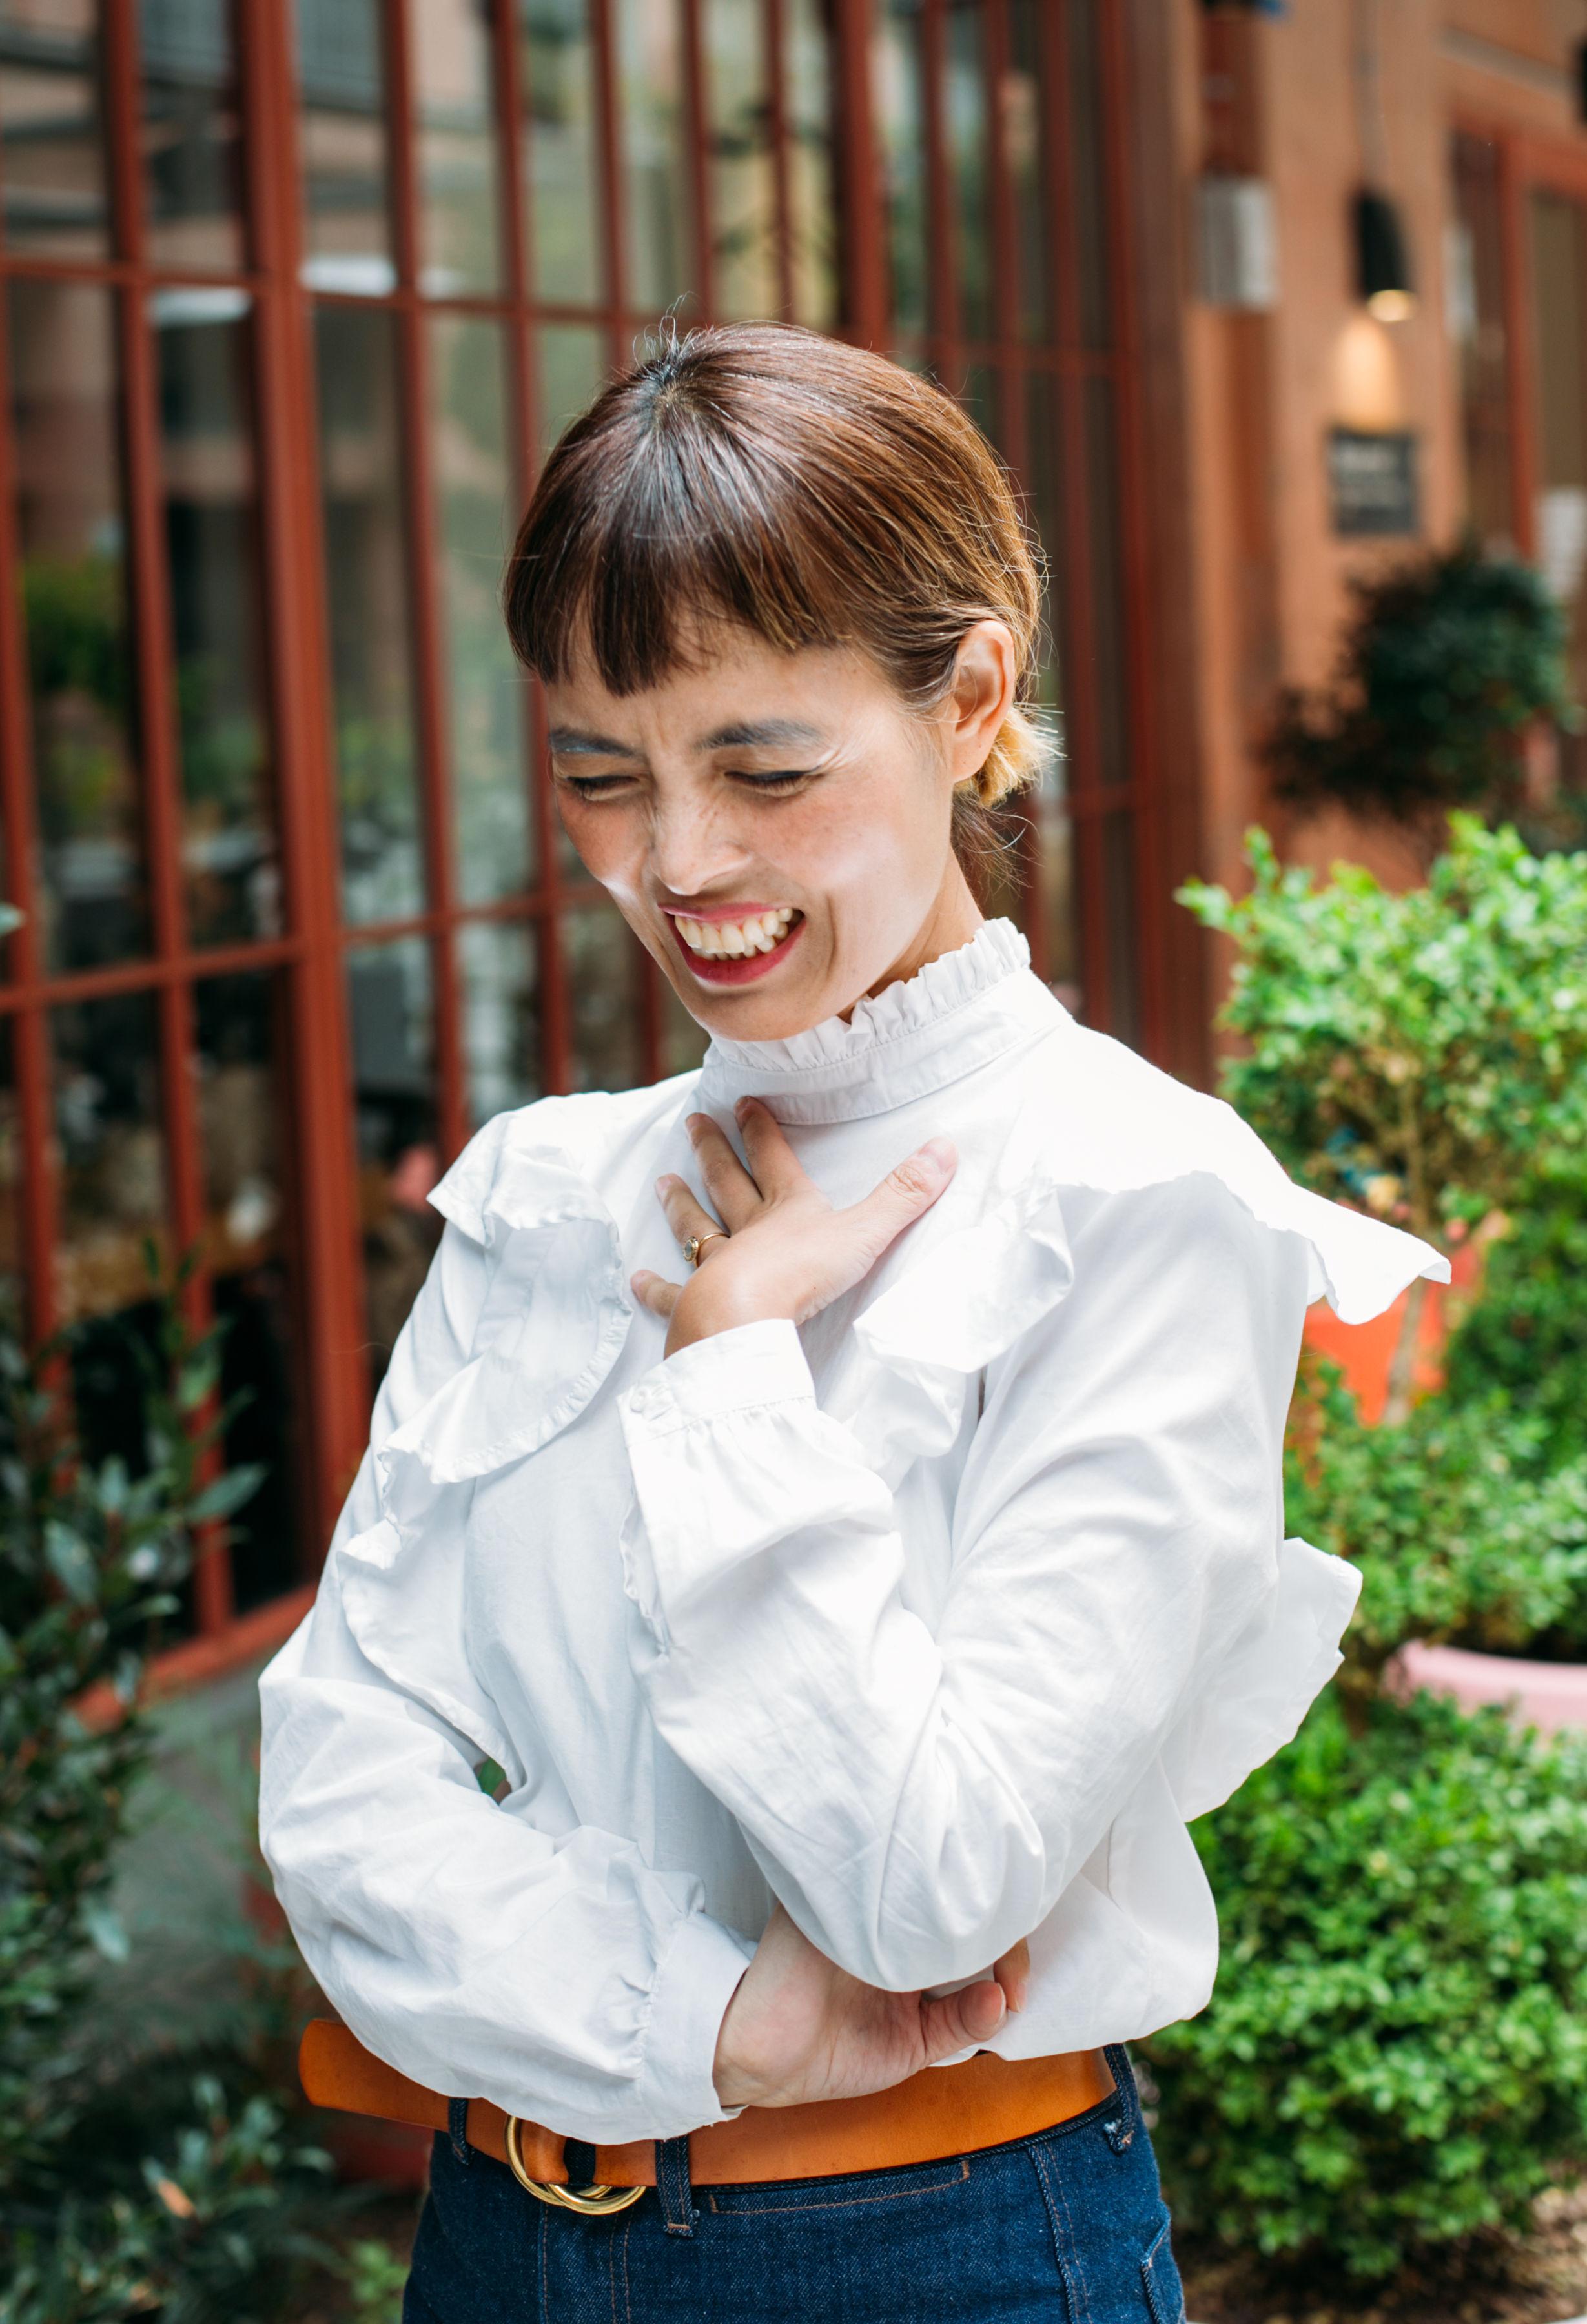 Angie Myung